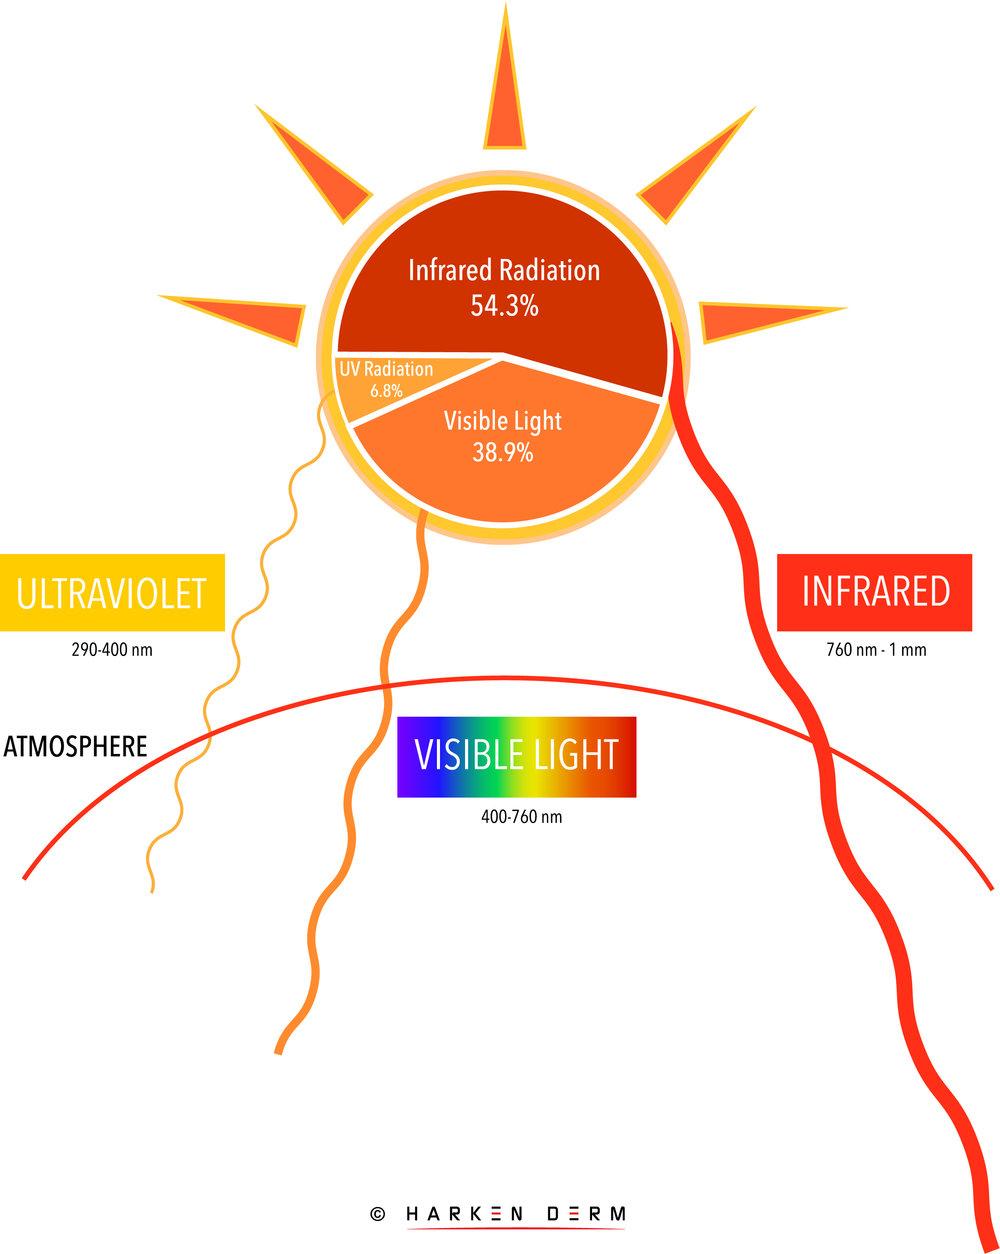 Solar Radiation Harken Derm_1@2x-100.jpg